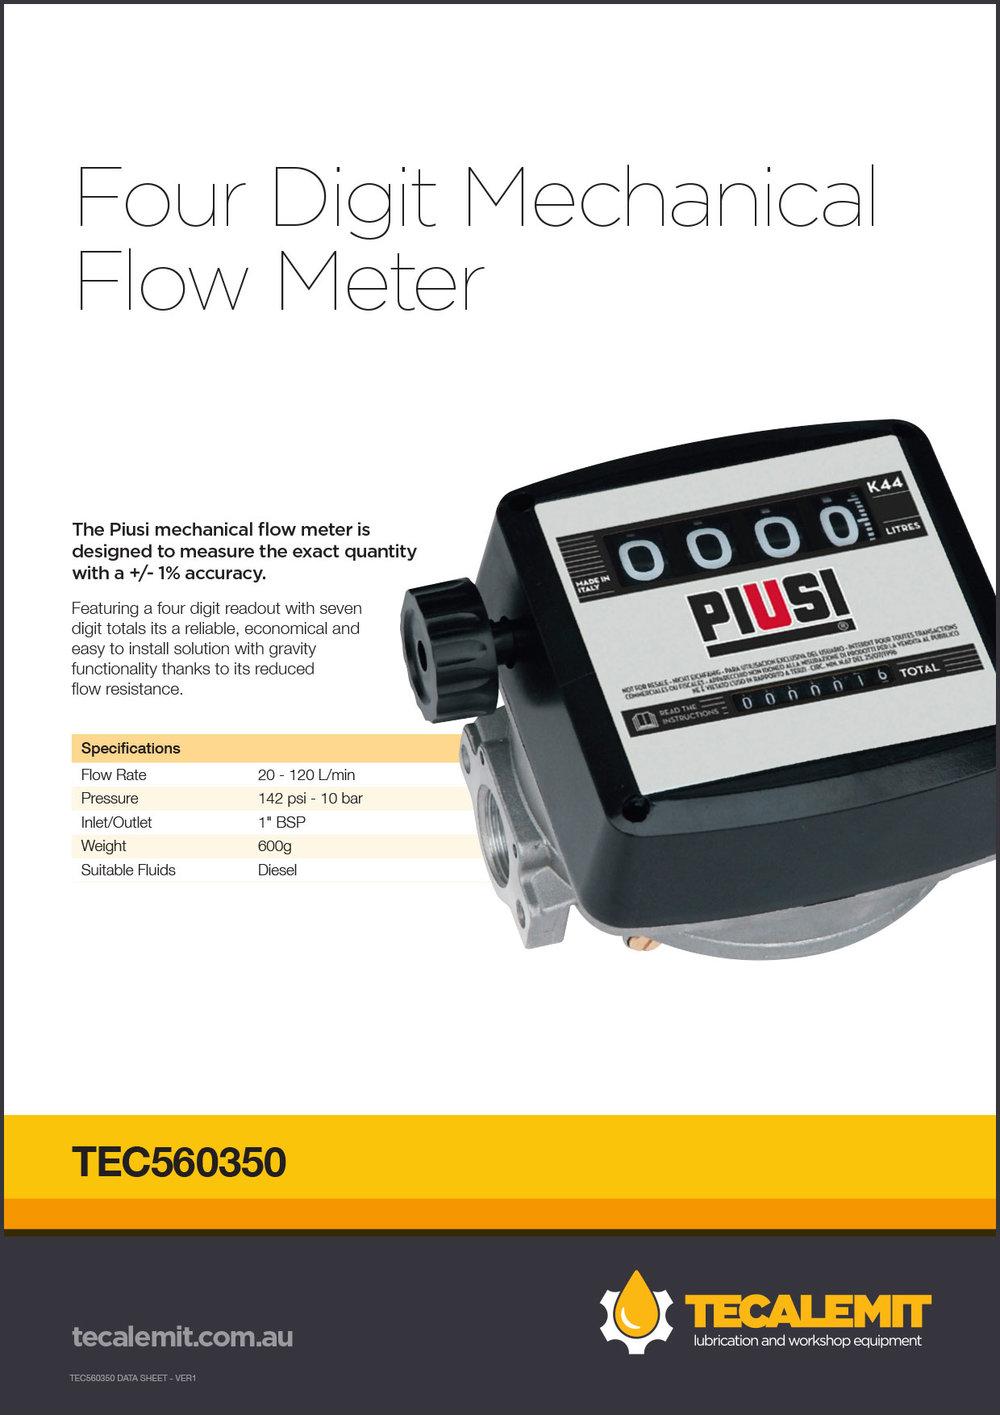 TEC560350 Product Info